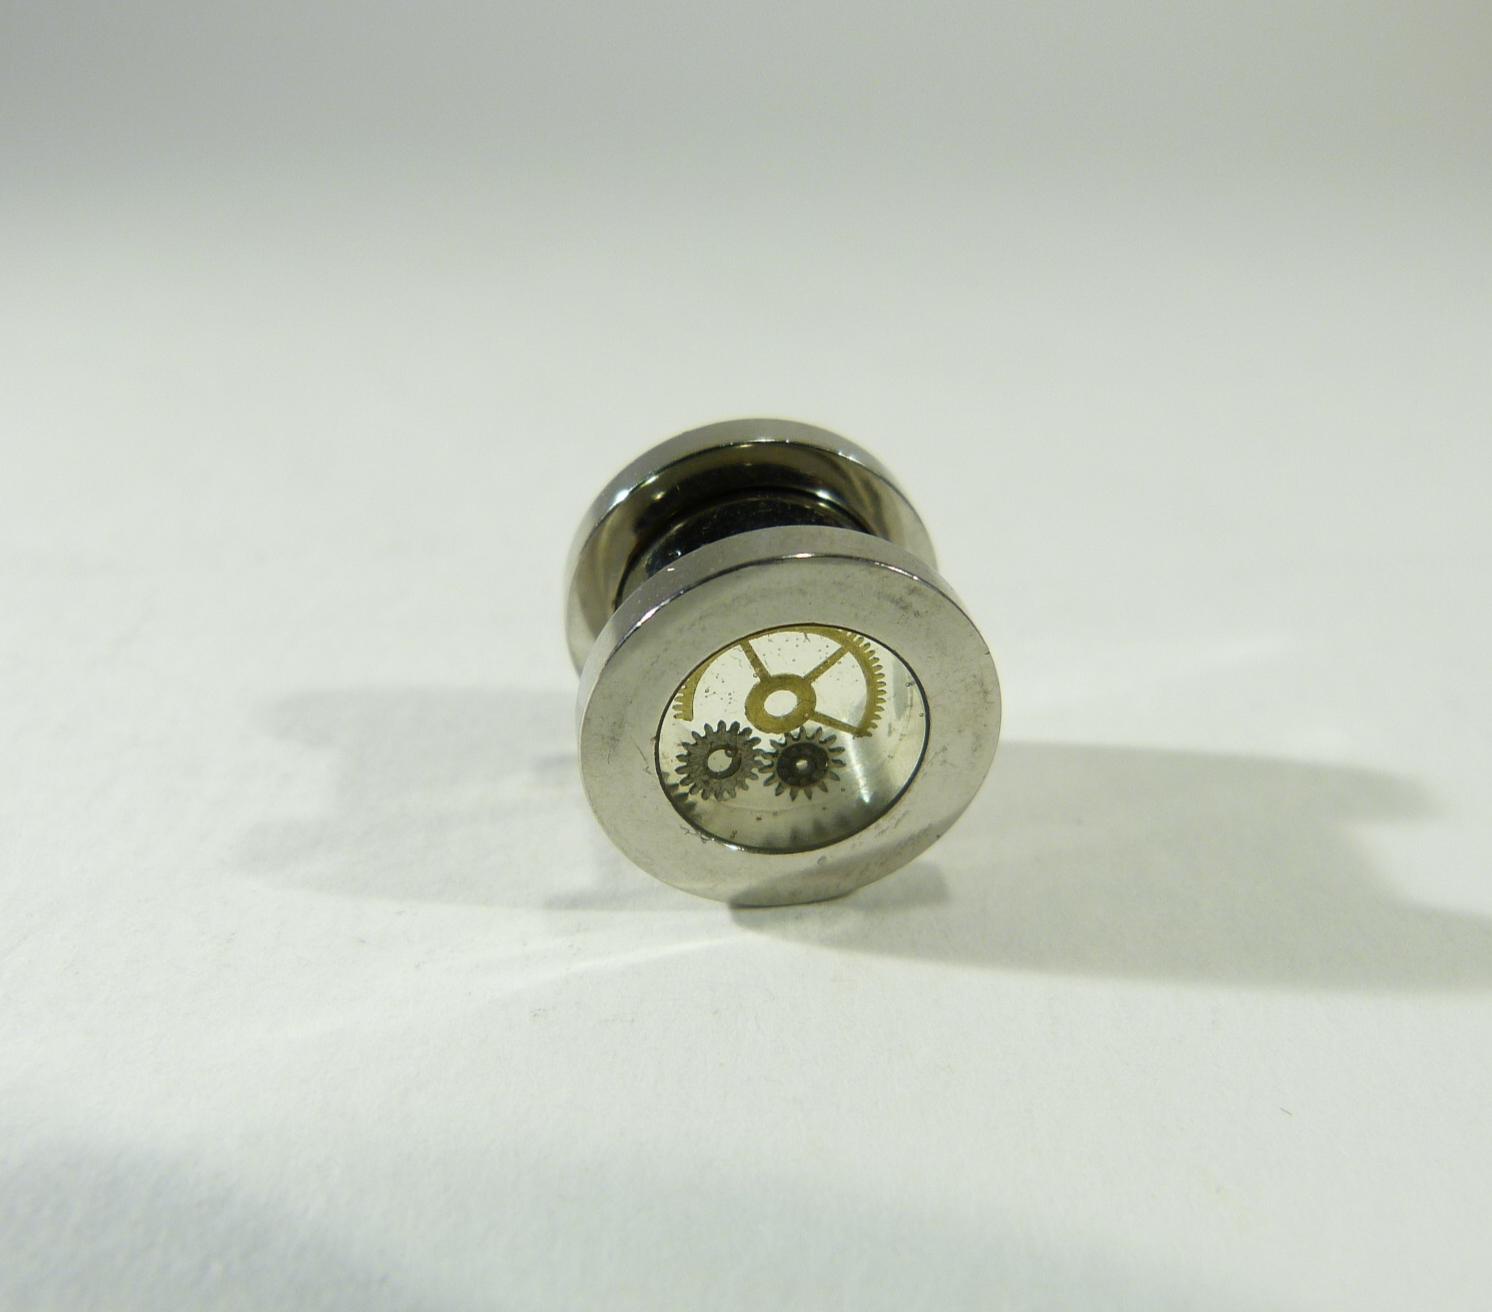 10mm plug